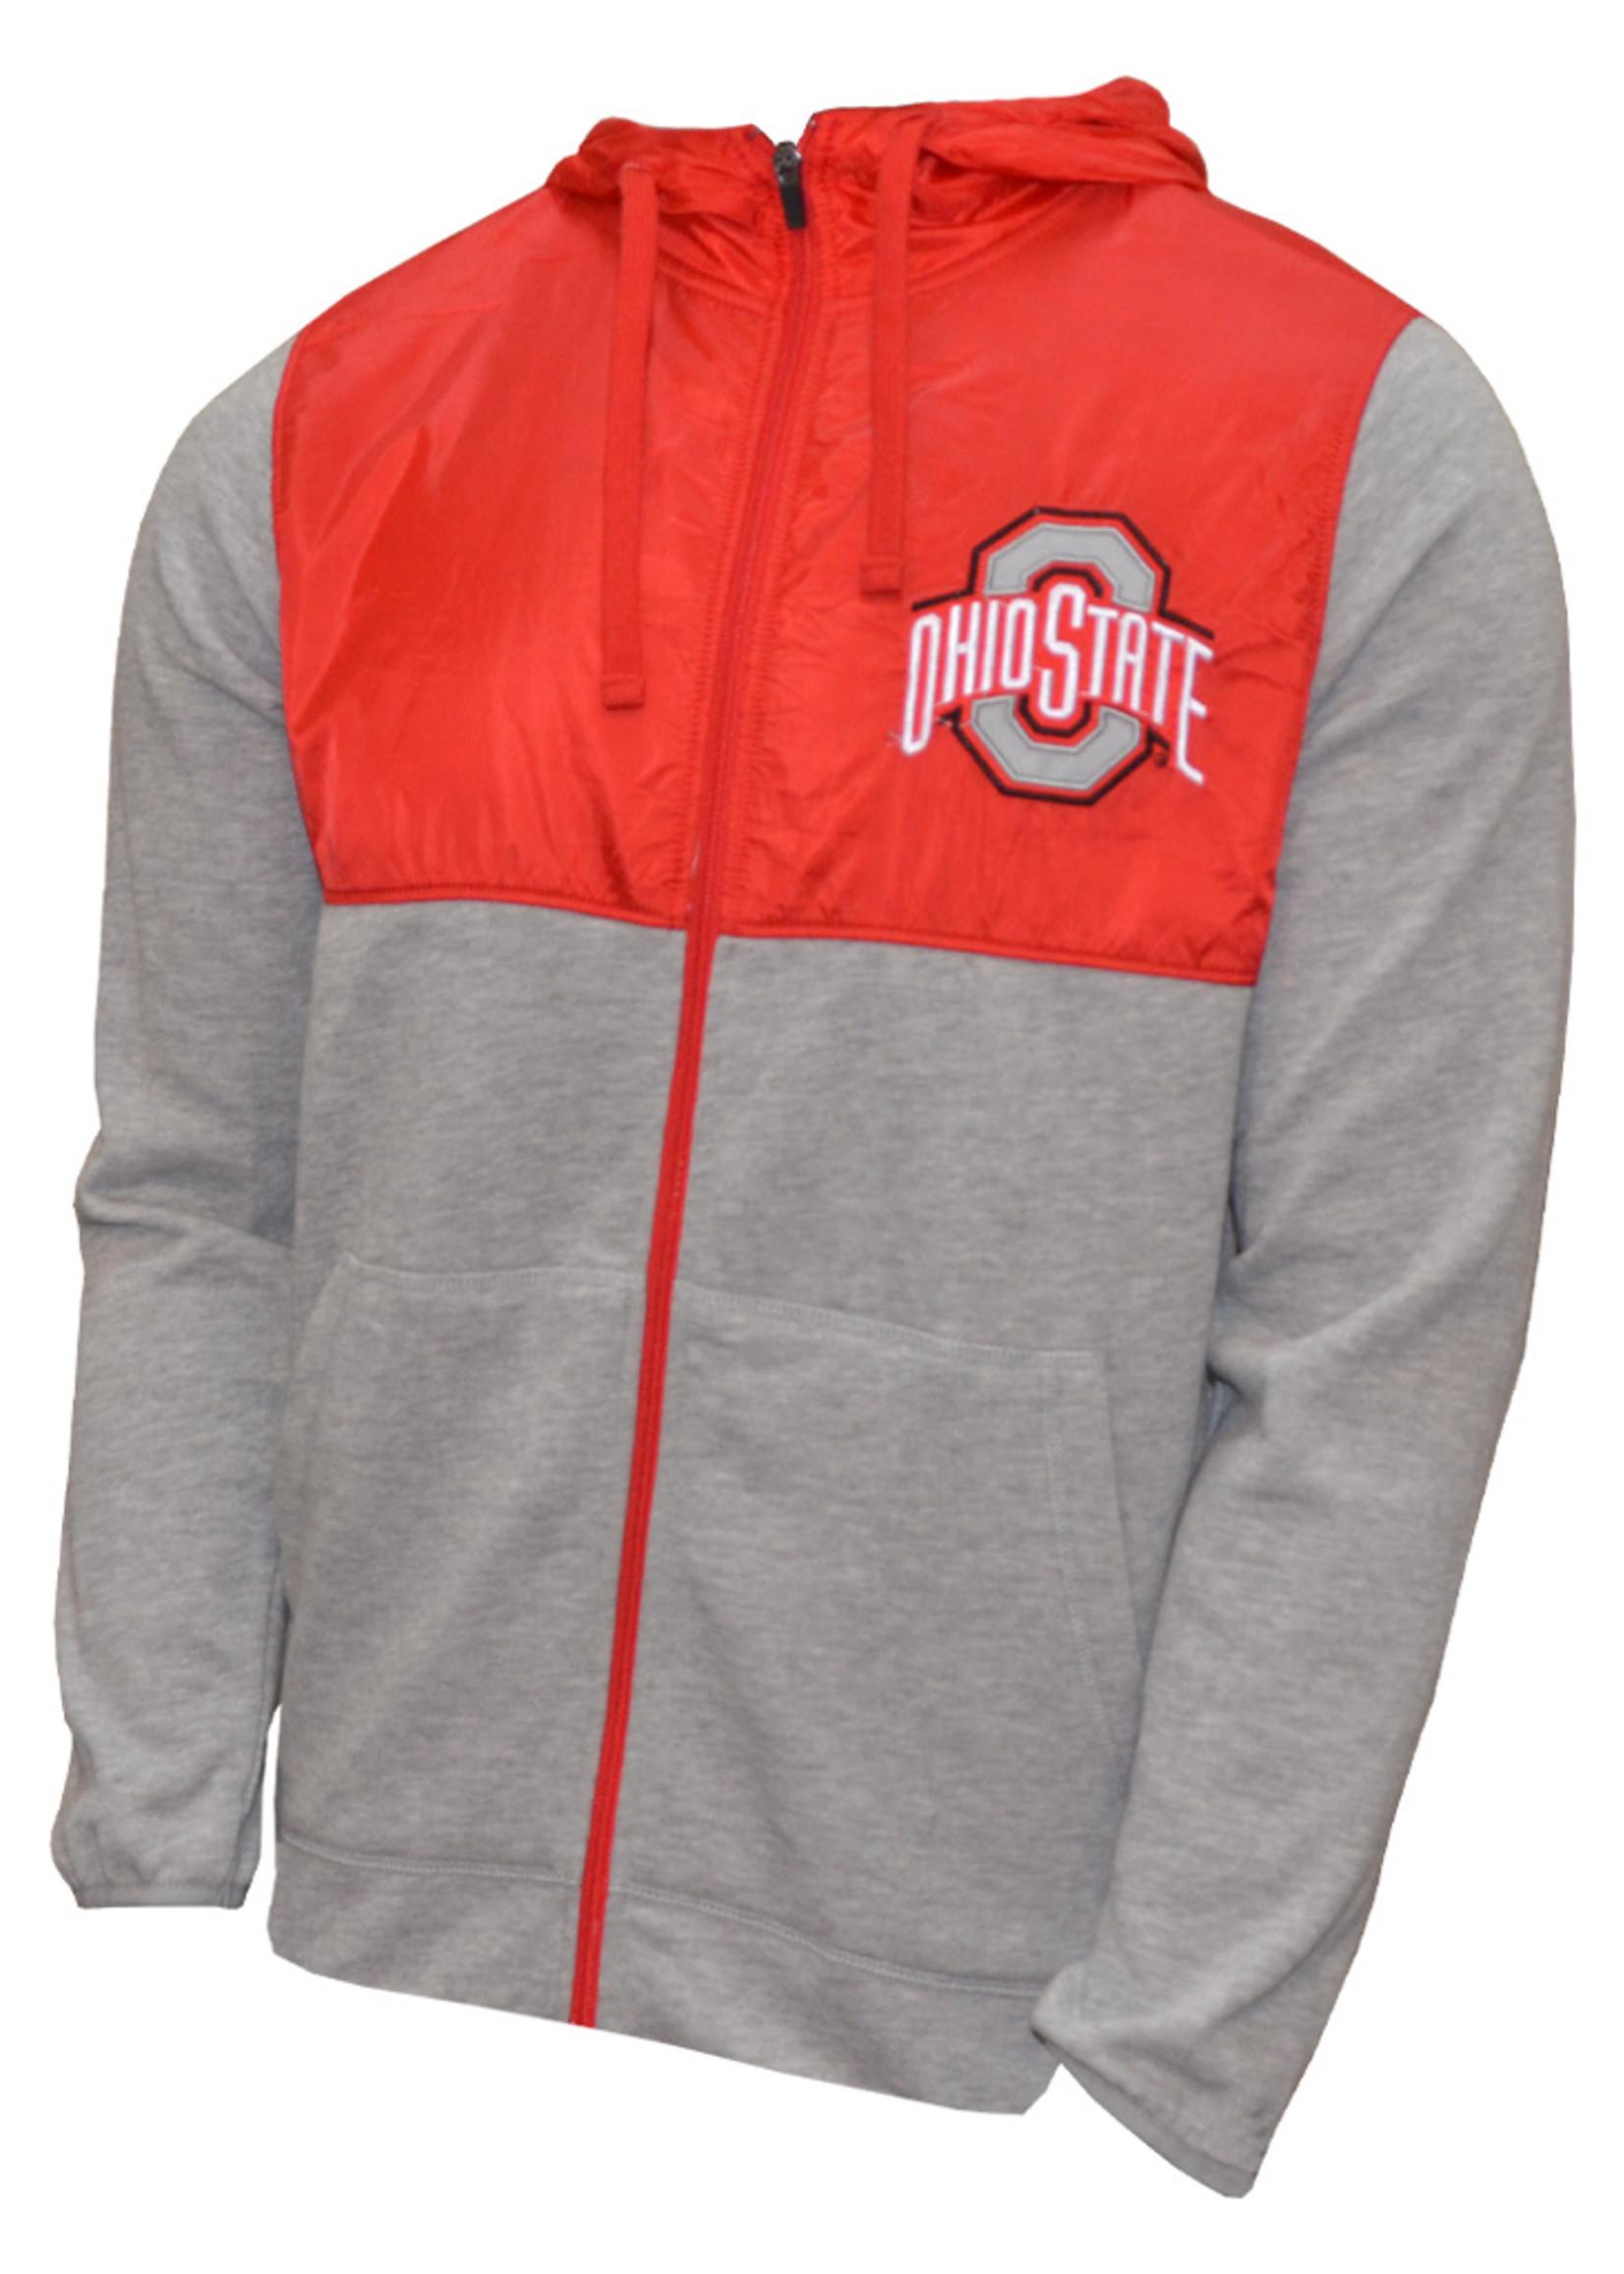 Ohio State Buckeyes Lightweight Hooded Jacket